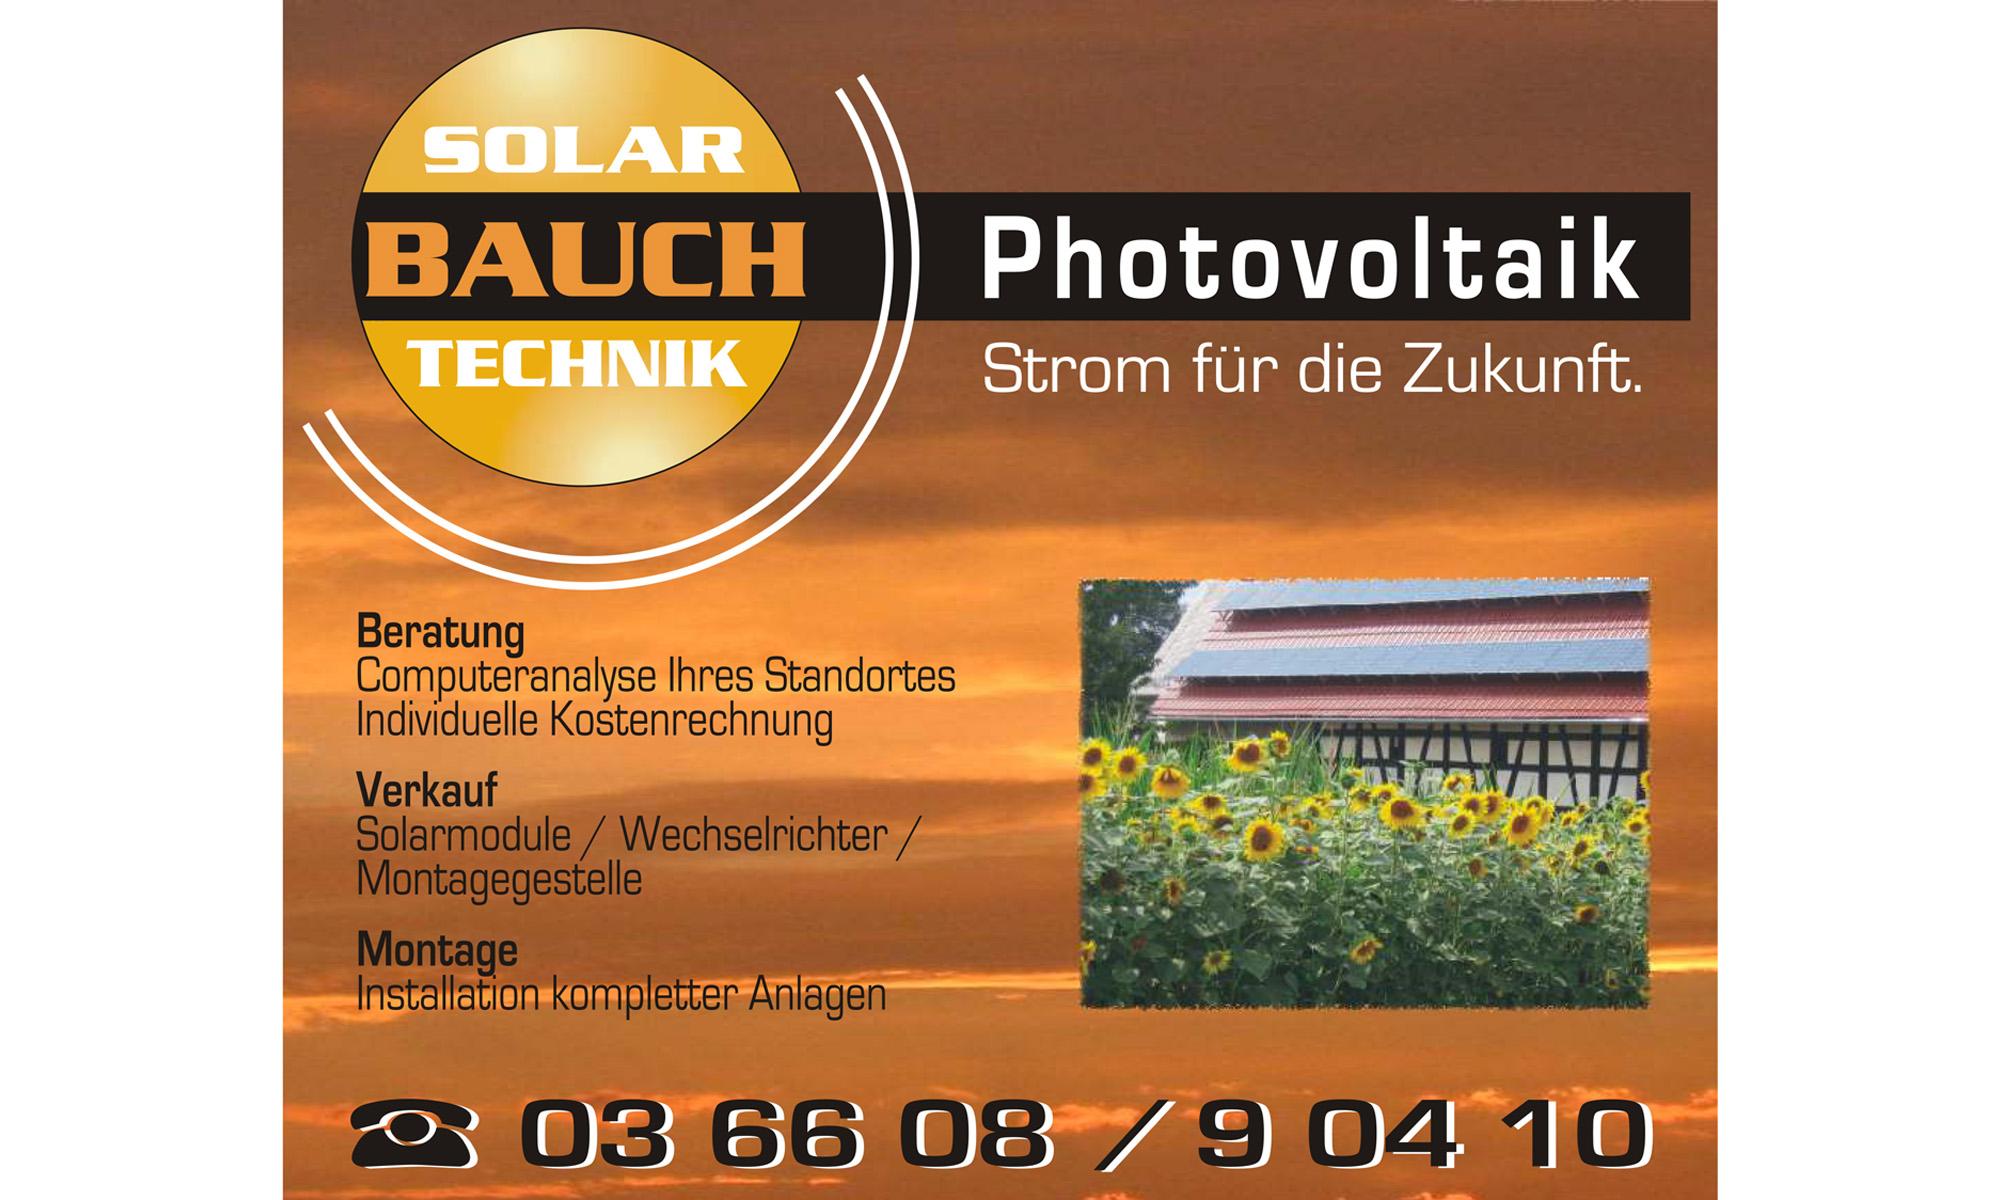 Solartechnik - Thomas Bauch